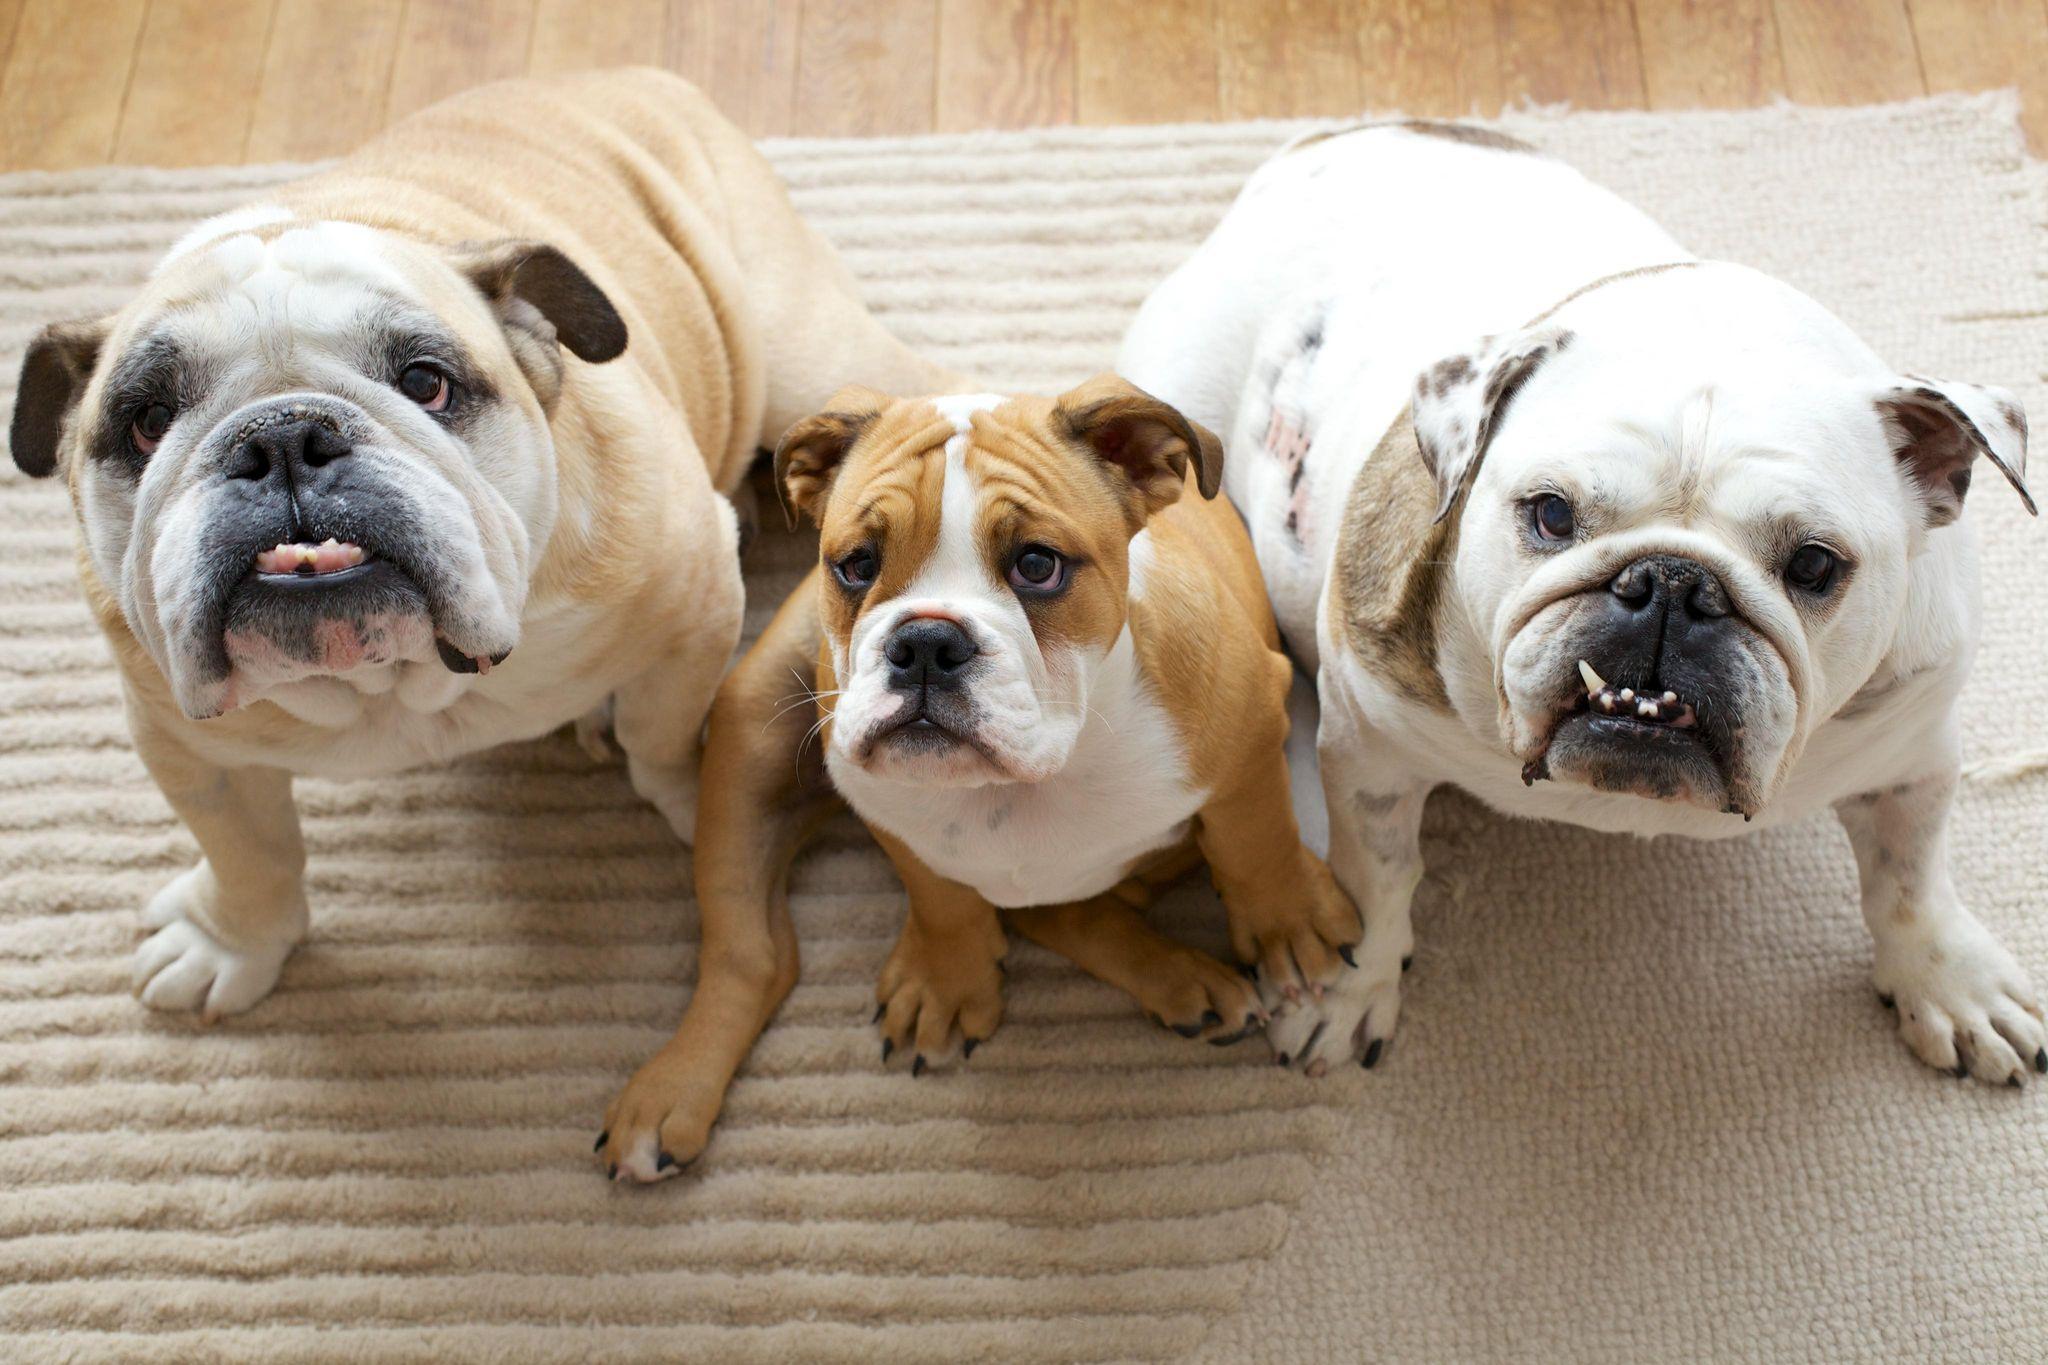 Three bulldogs sat together